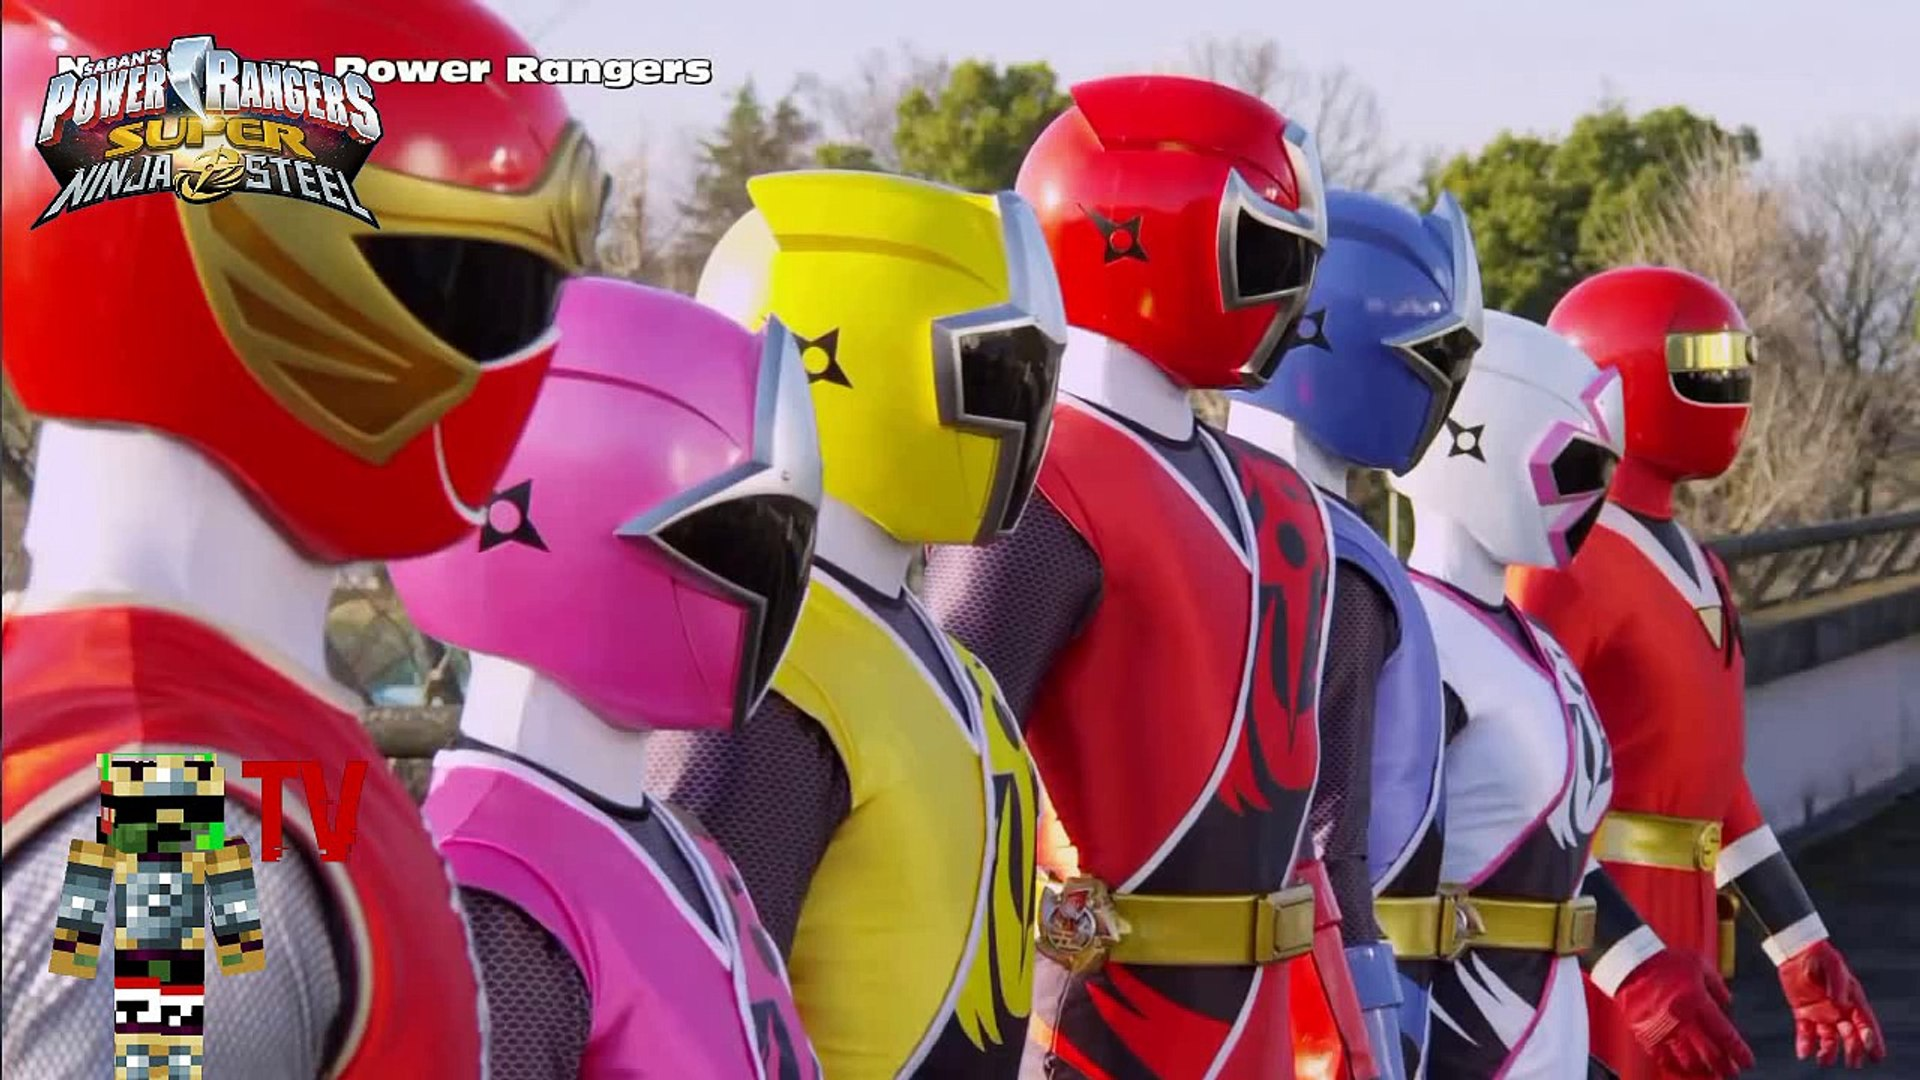 AVANT-PREMIERE PREVIEW - Power Rangers Super Ninja Steel